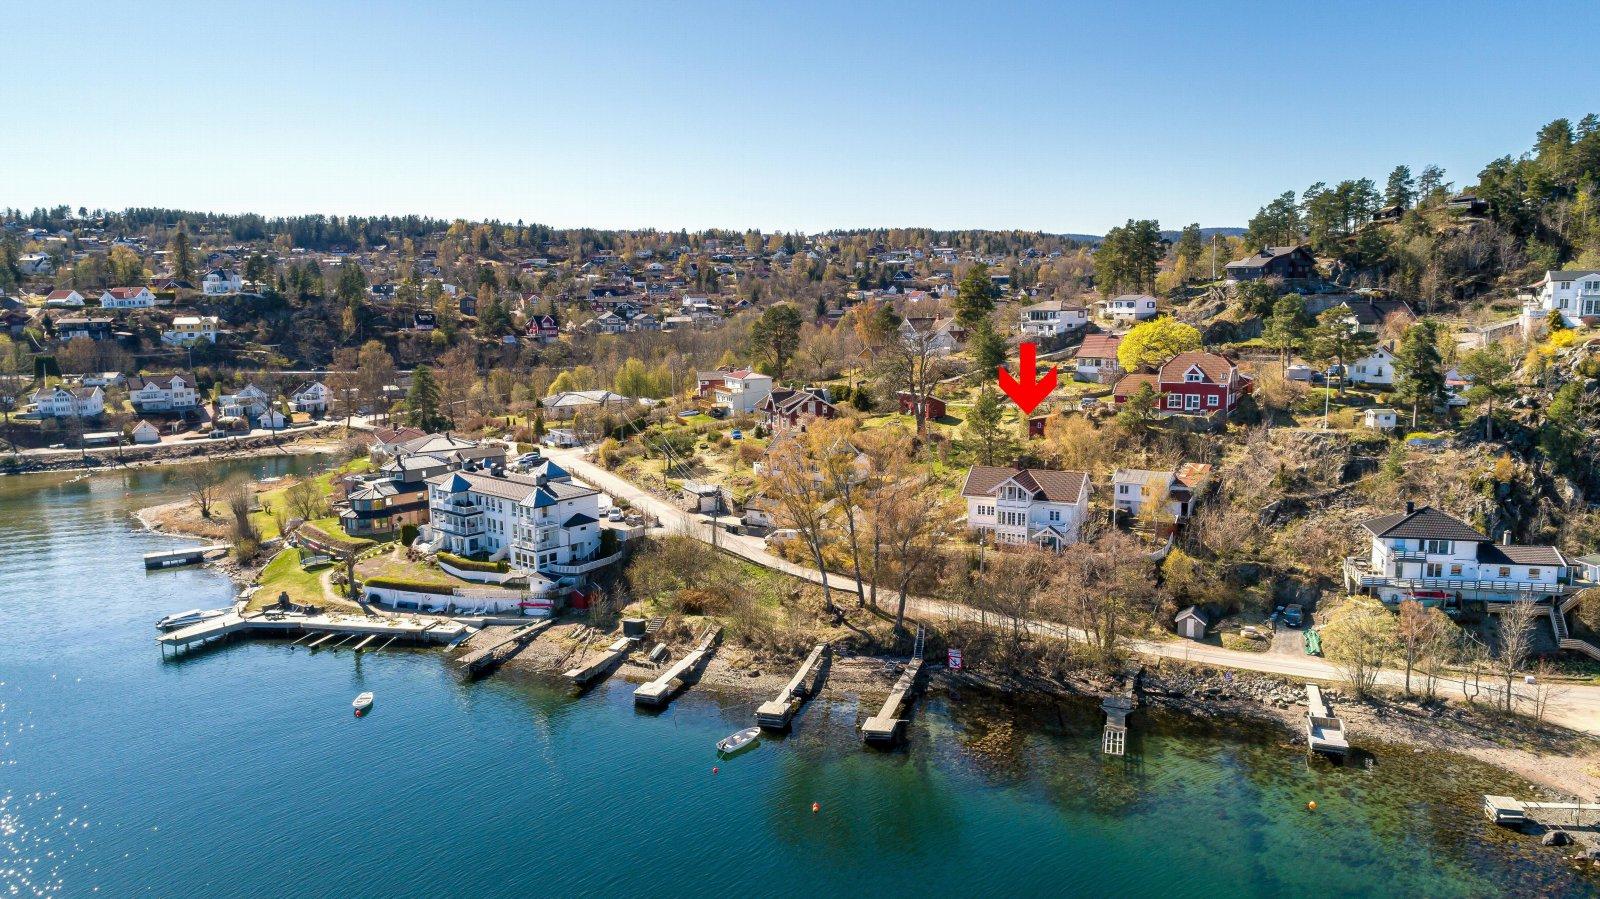 Dronefoto over brygge og boligen